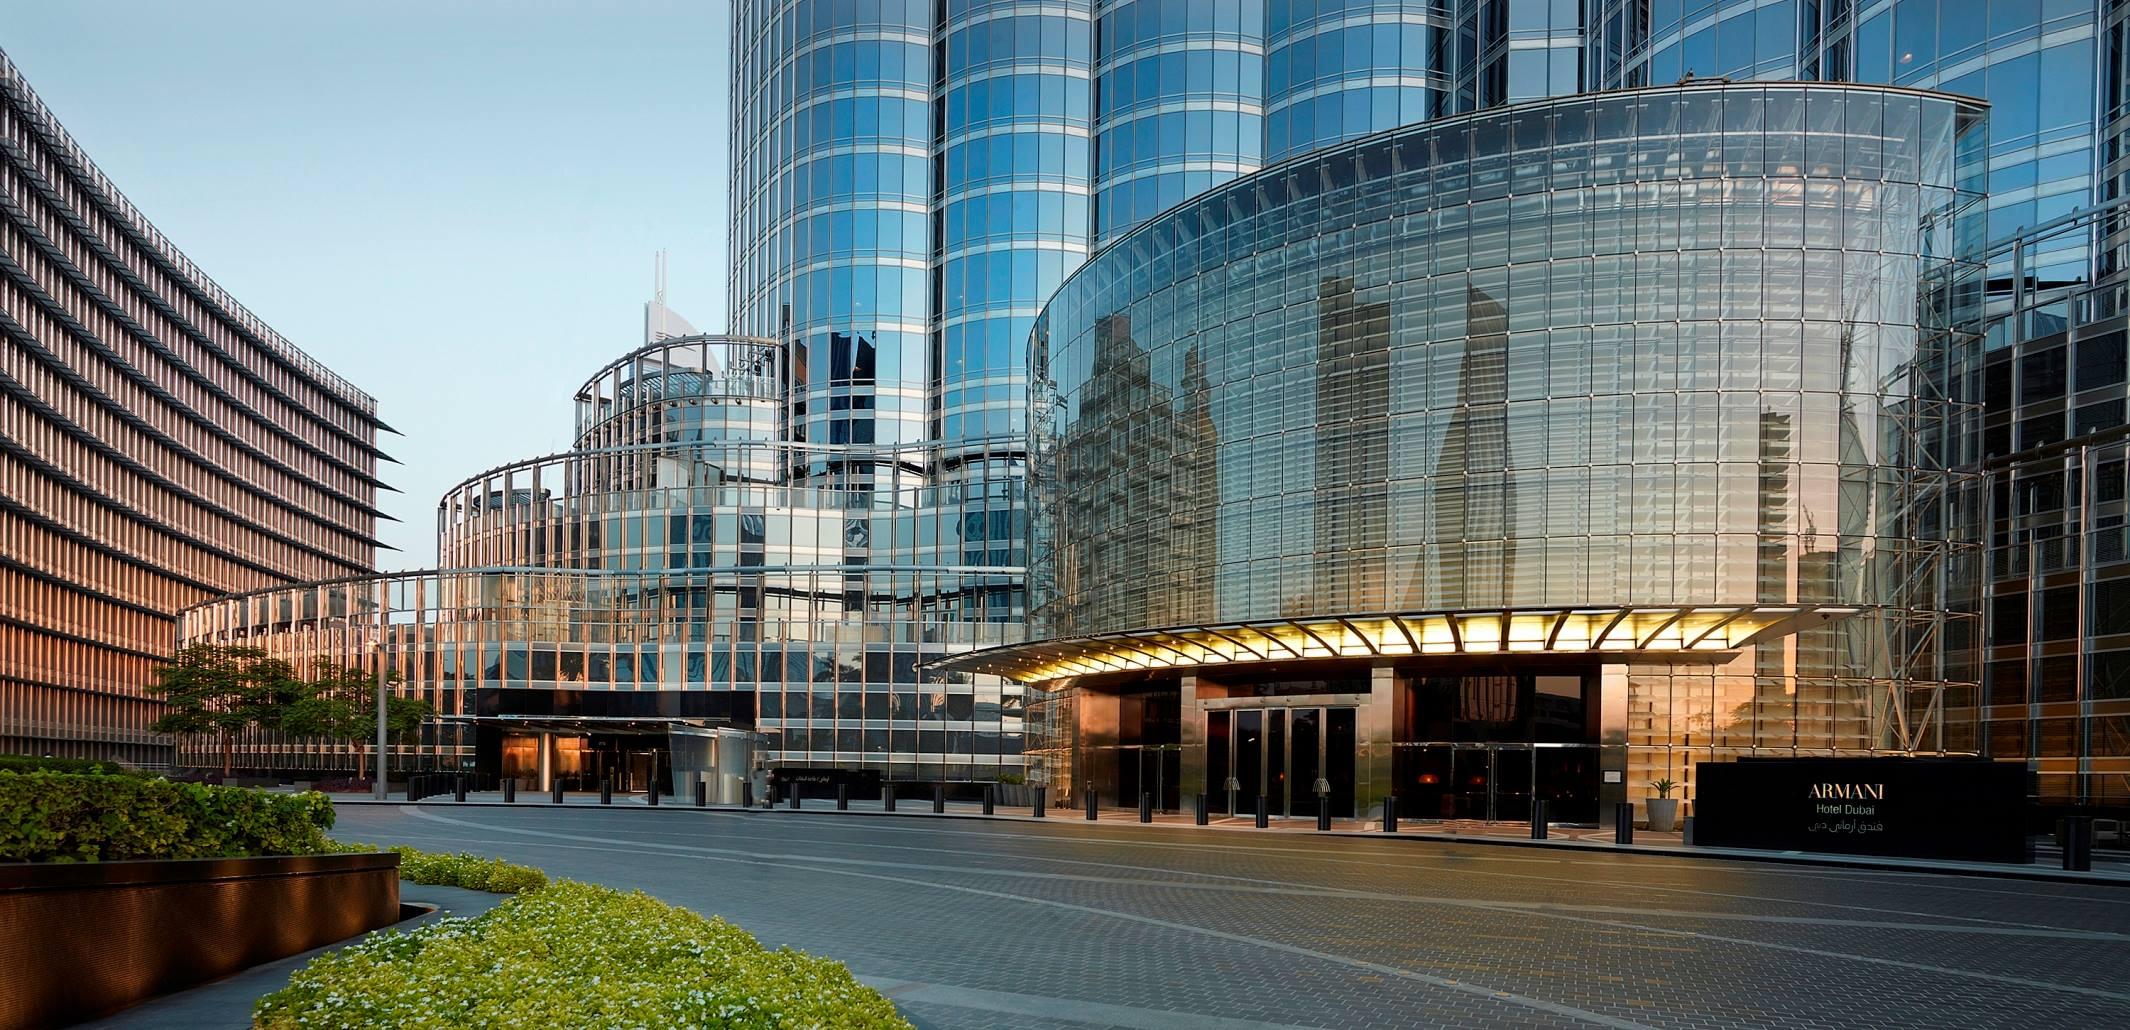 Armani Hotel Dubai at Burj Khalifa